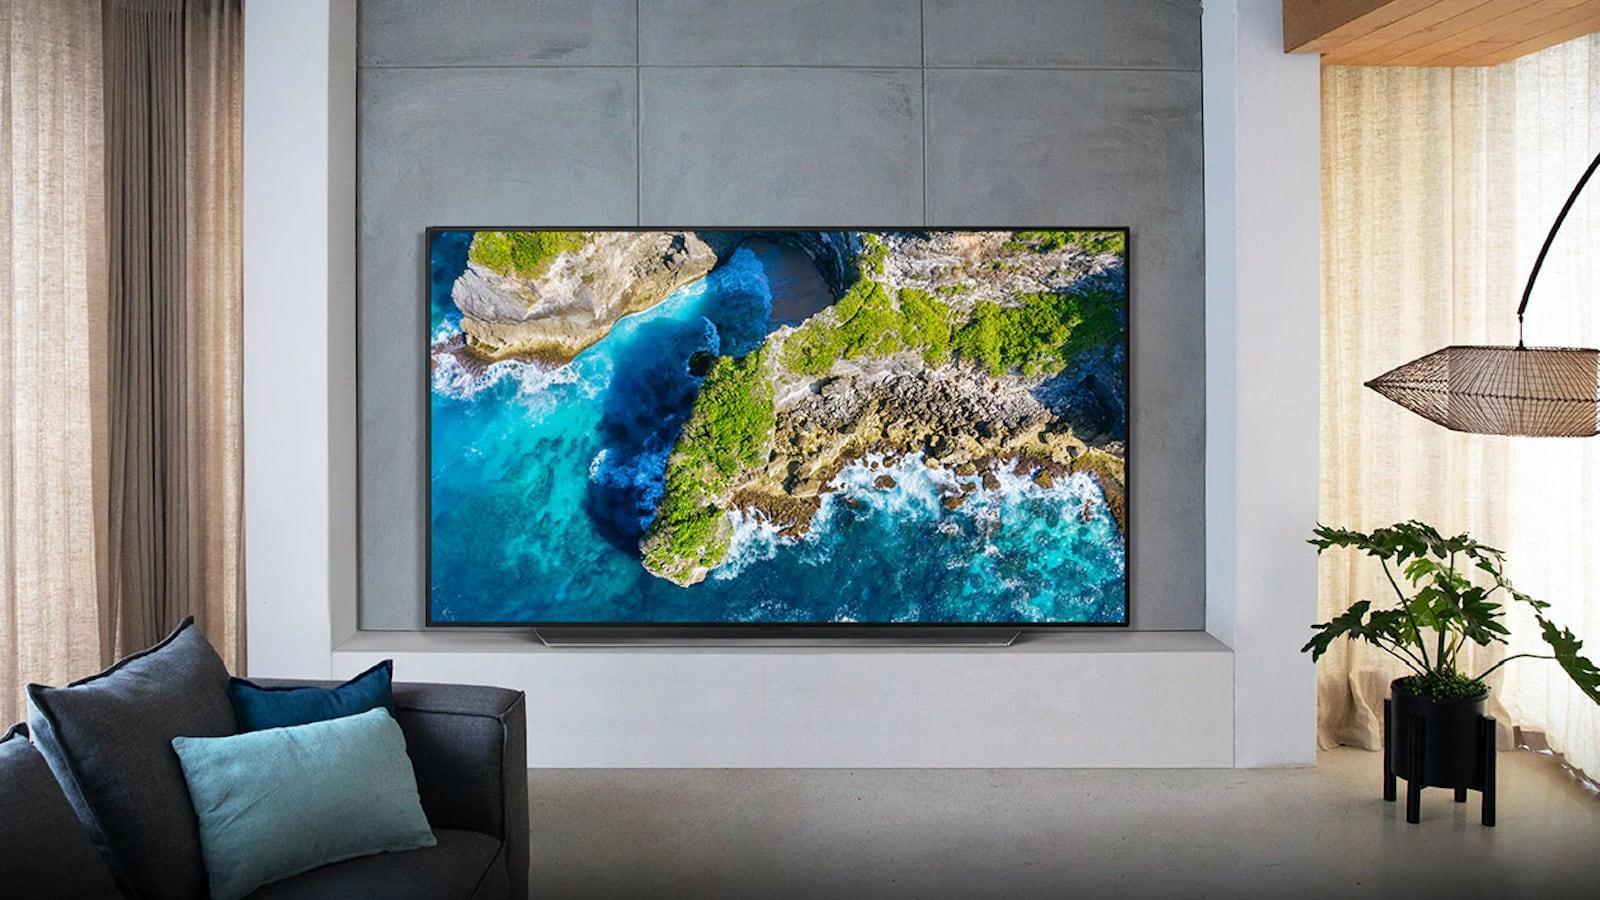 LG OLED 48CX 4K Ultra HD TV